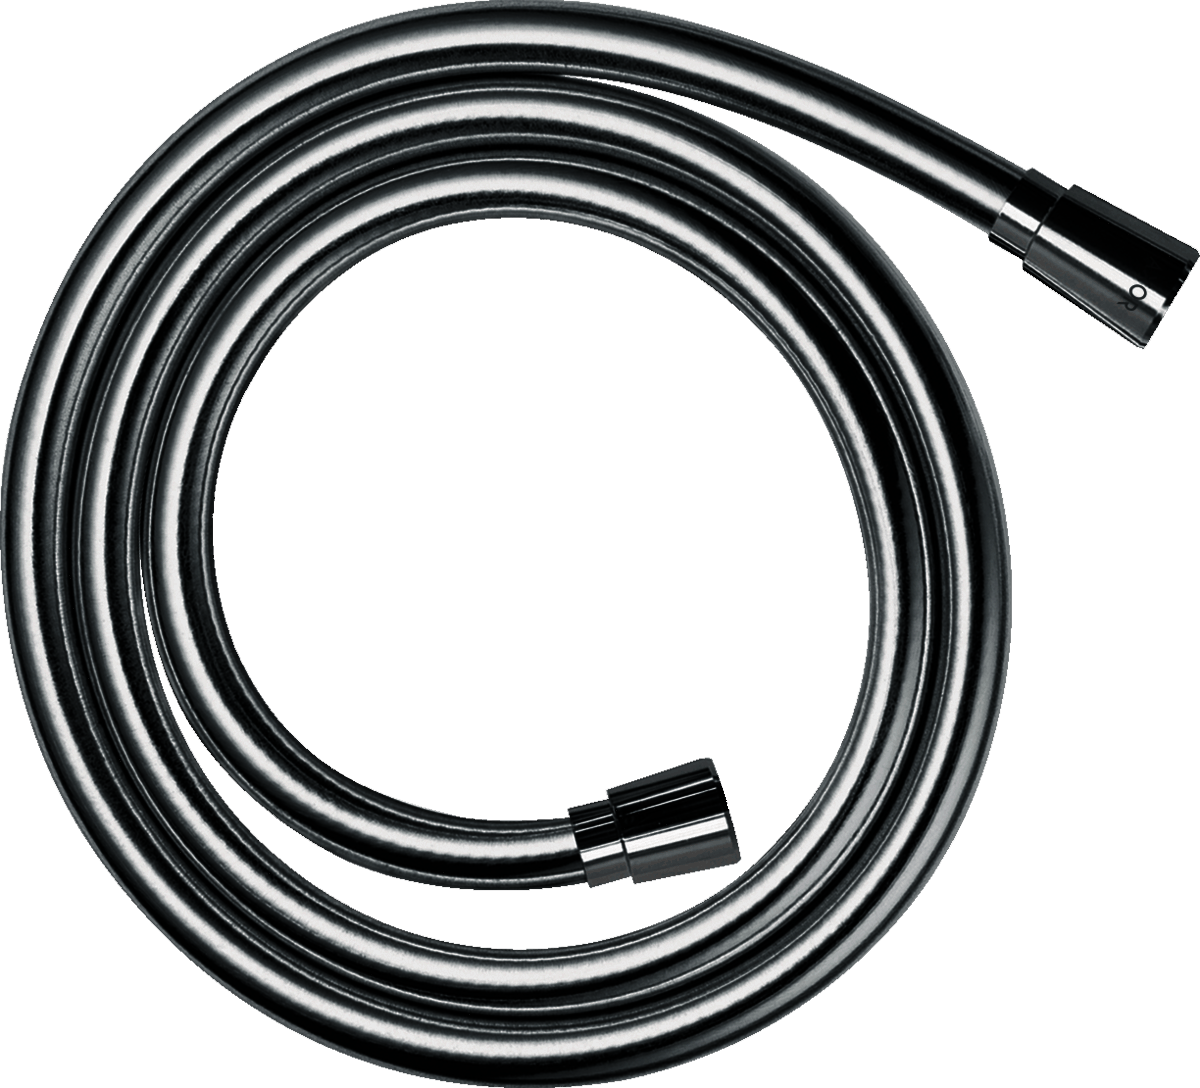 Sprchová hadice Hansgrohe Axor 1600 mm, kartáčovaná mosaz 28626950